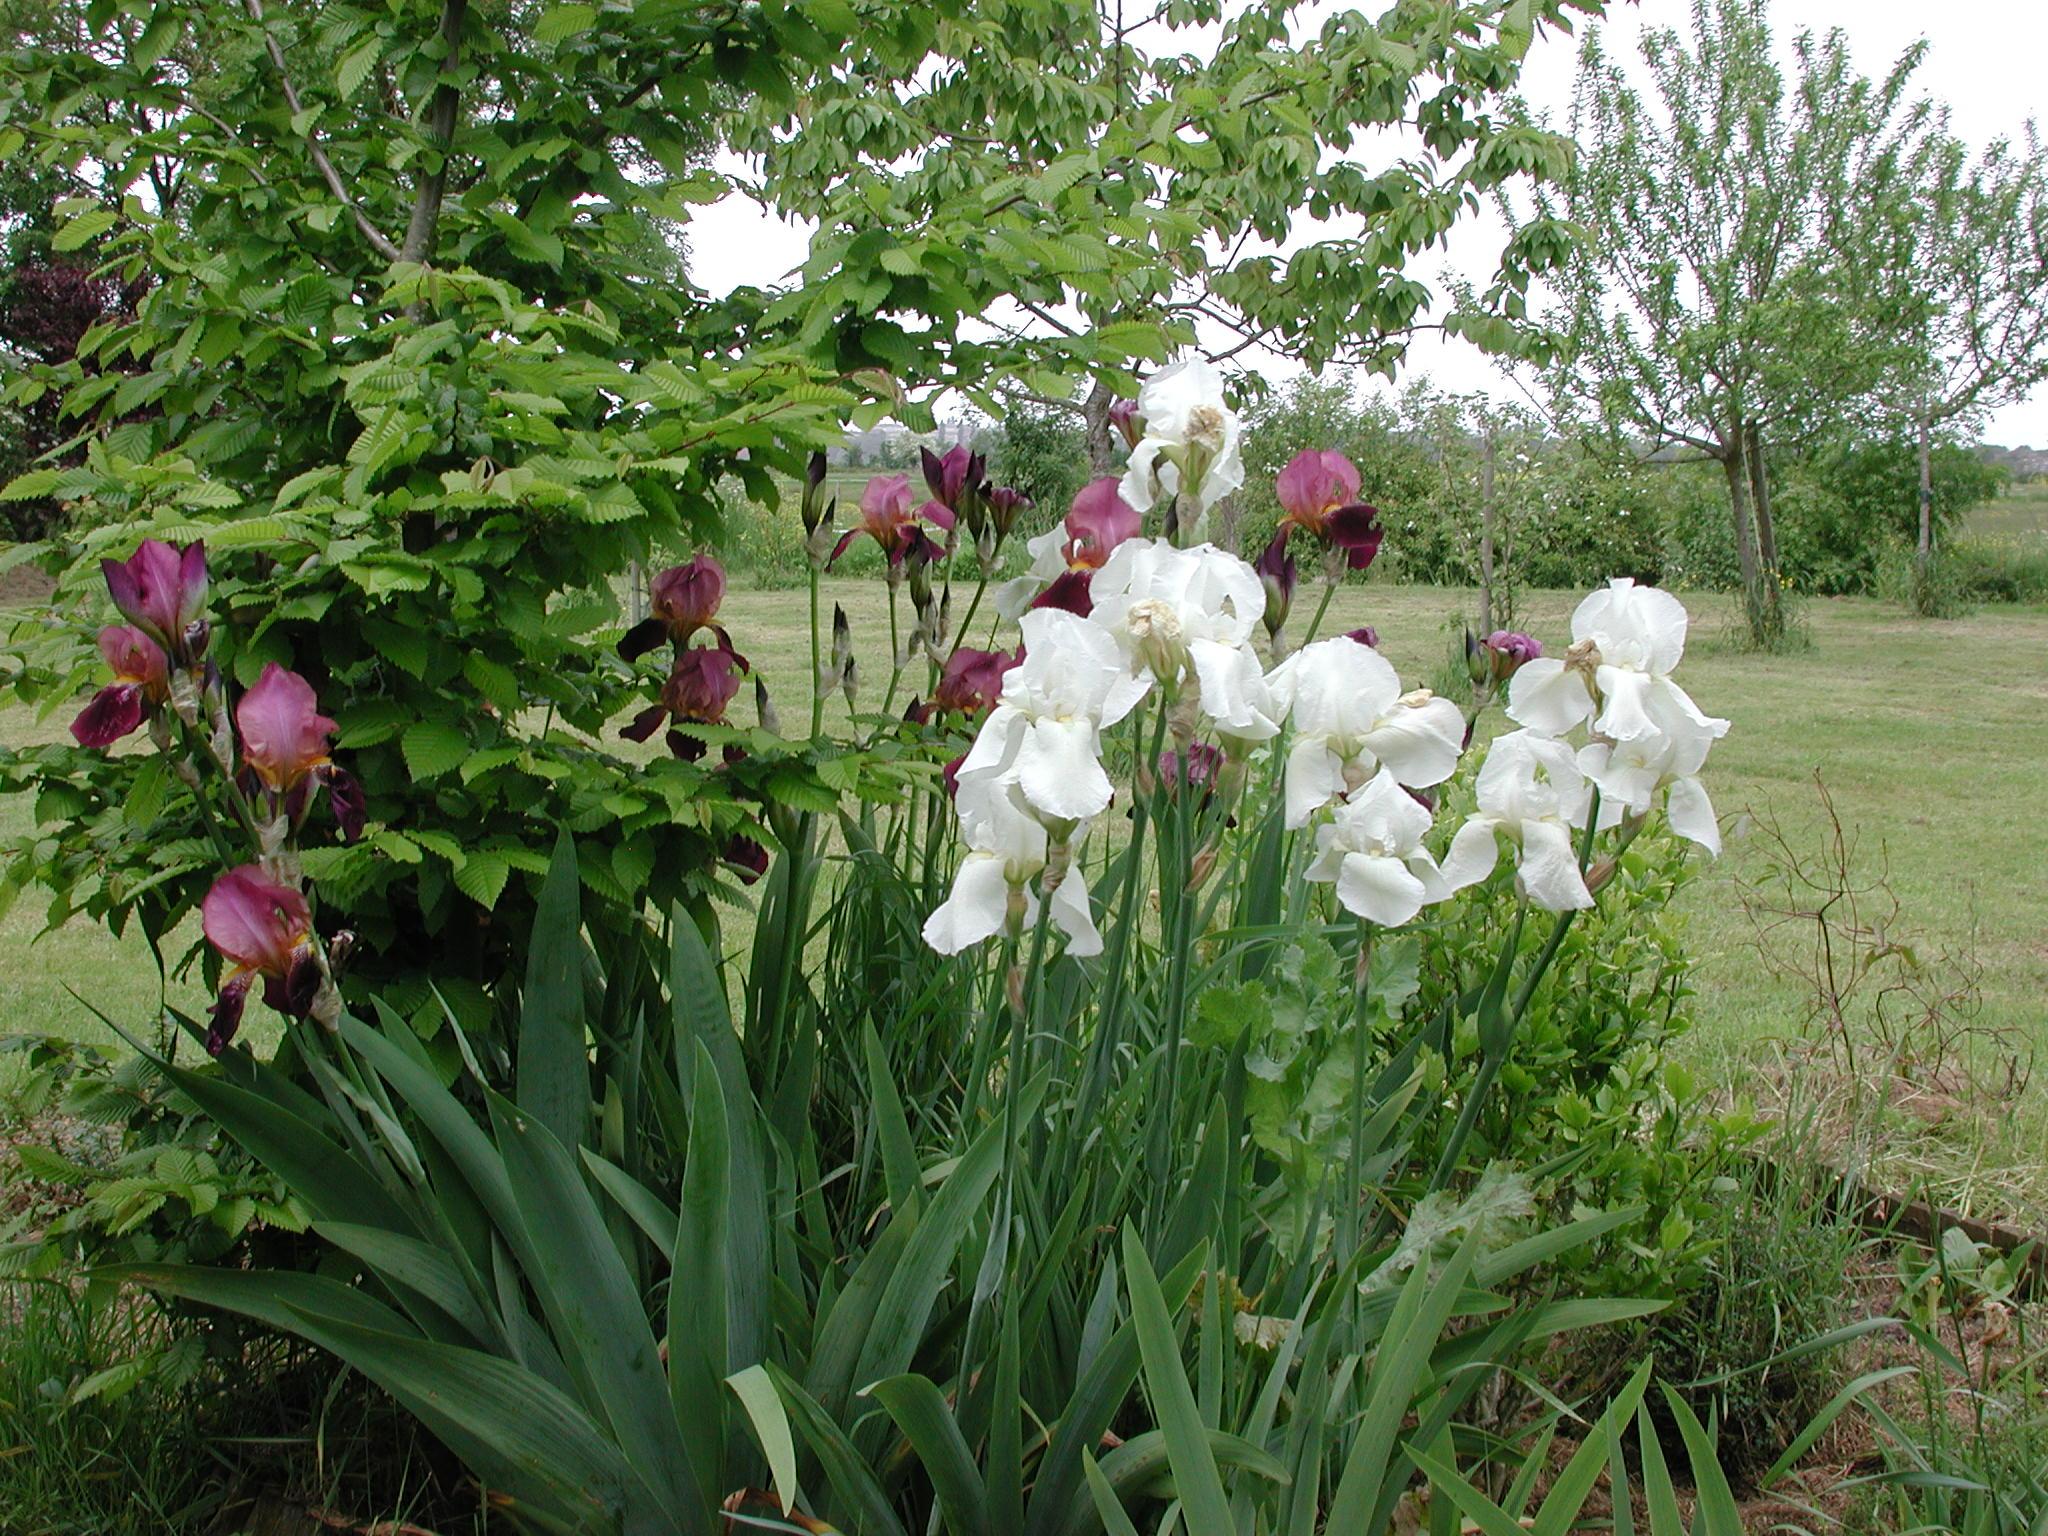 rhizomes d iris fichus au jardin forum de jardinage. Black Bedroom Furniture Sets. Home Design Ideas